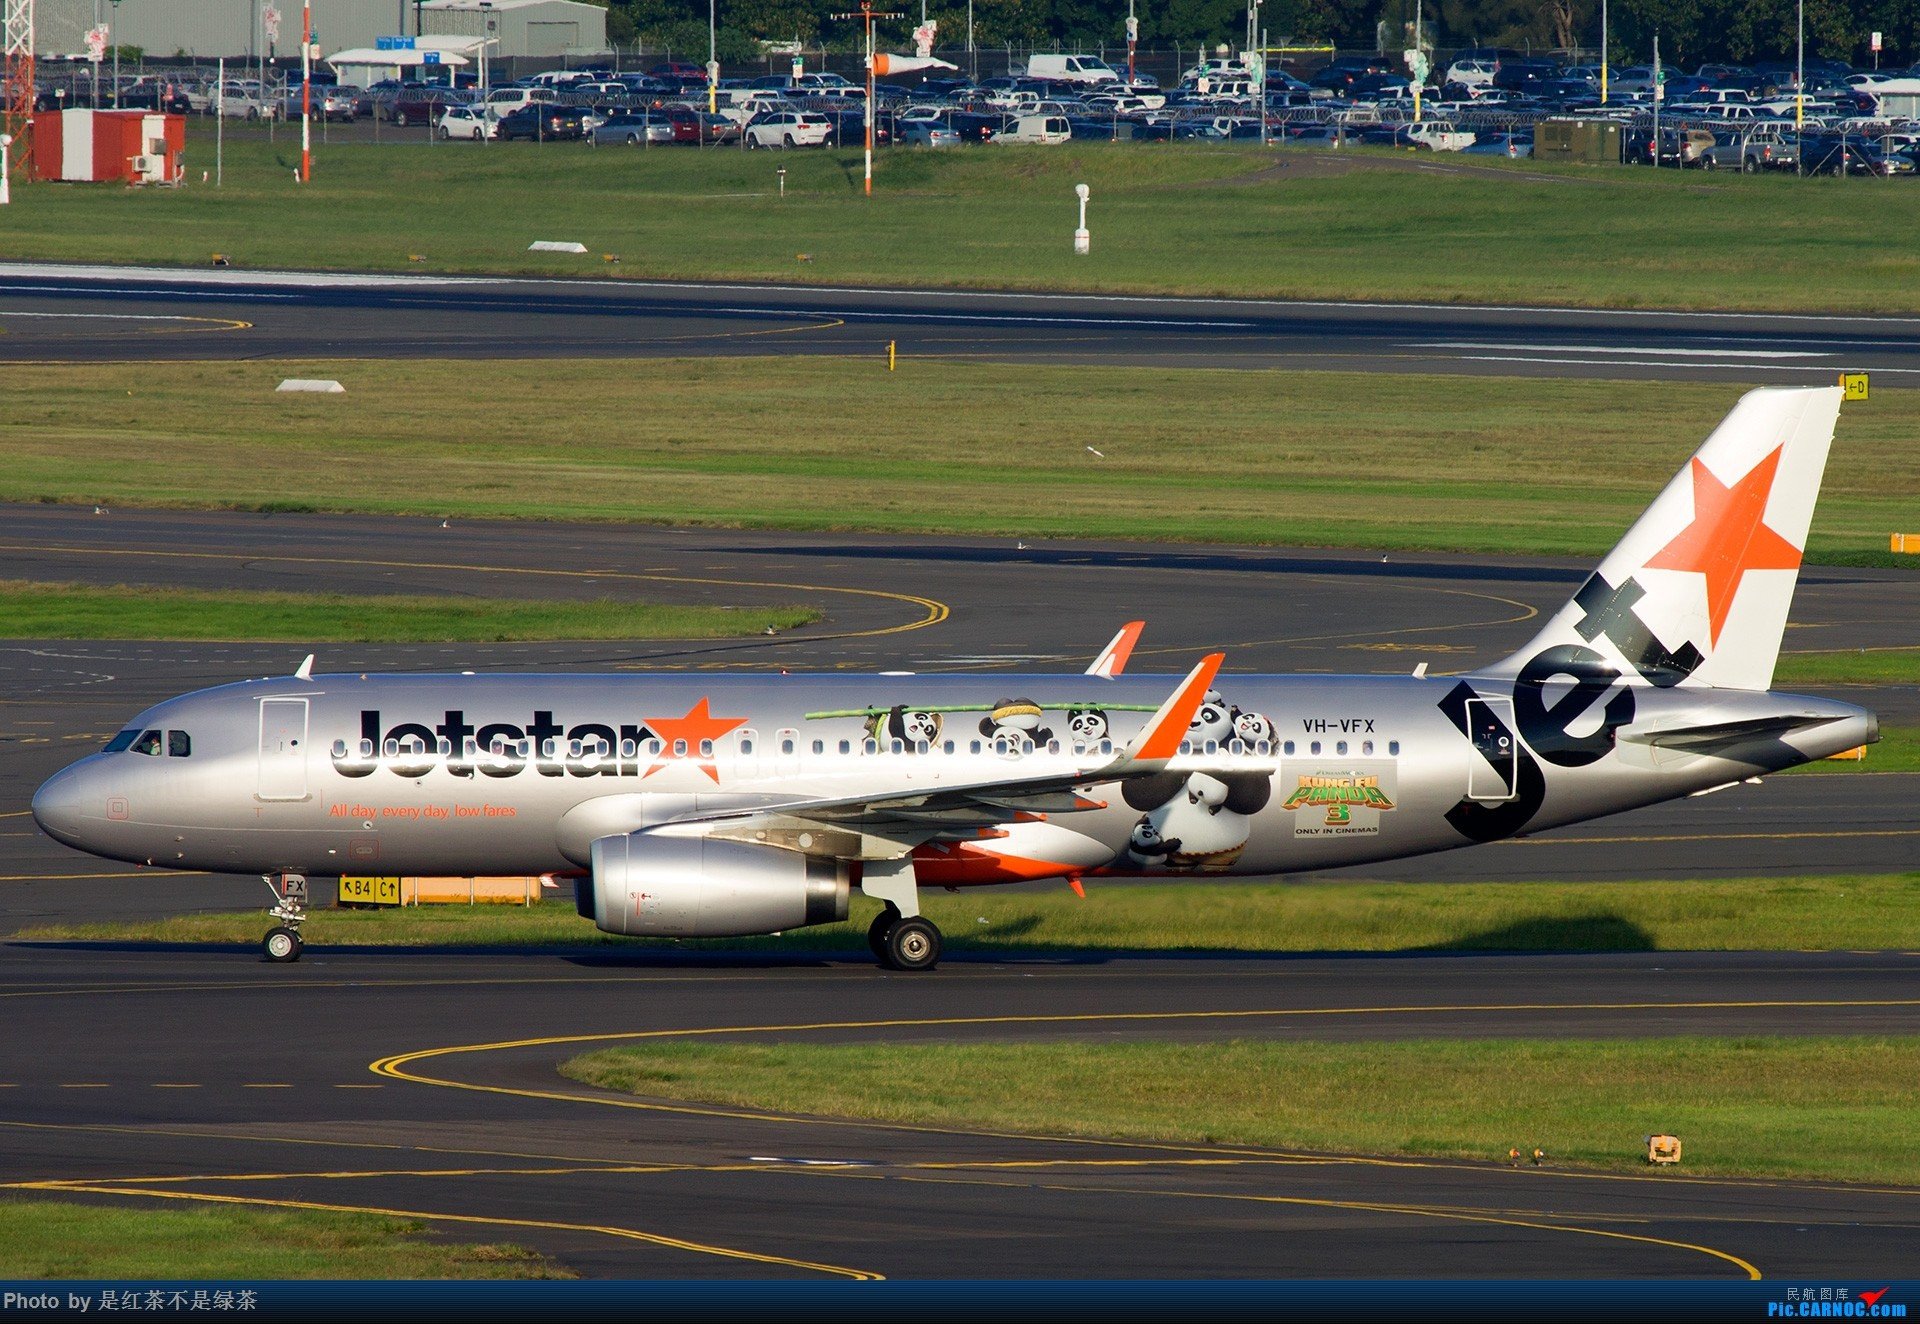 Re:[原创]【红茶拍机】澳洲行半日拍机,距离上次发帖居然有10个月了! AIRBUS A320-200 VH-VFX 澳大利亚悉尼金斯福德·史密斯机场